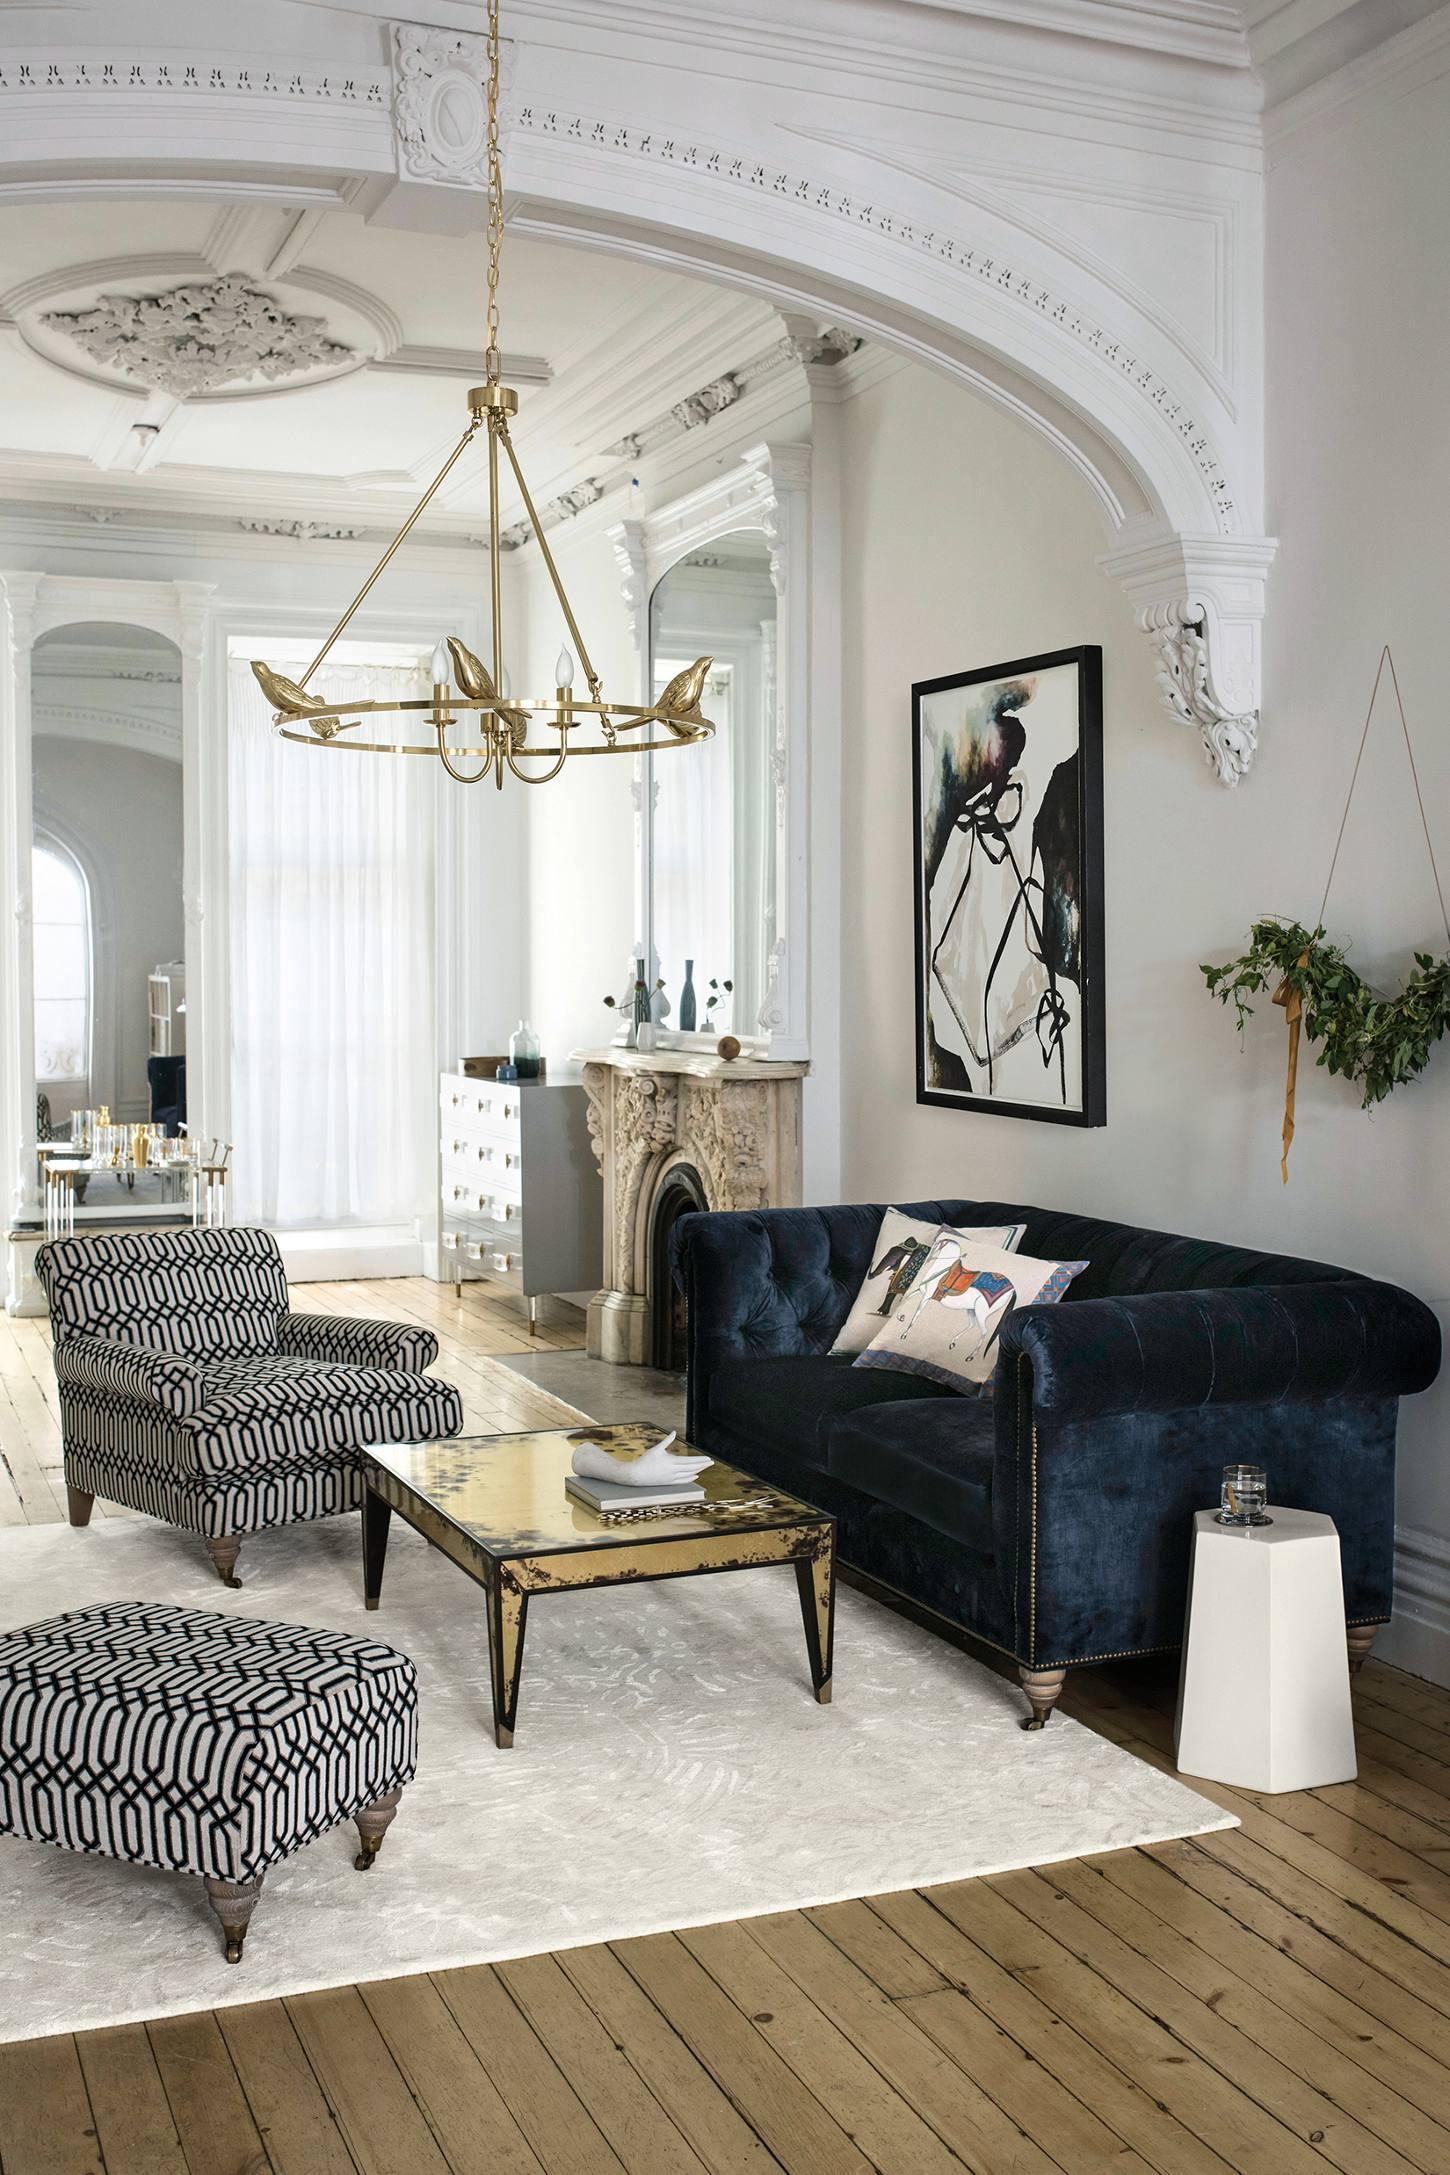 Living Room With Chesterfield Sofa Velvet Lyre Chesterfield Sofa Wilcox Anthropologie